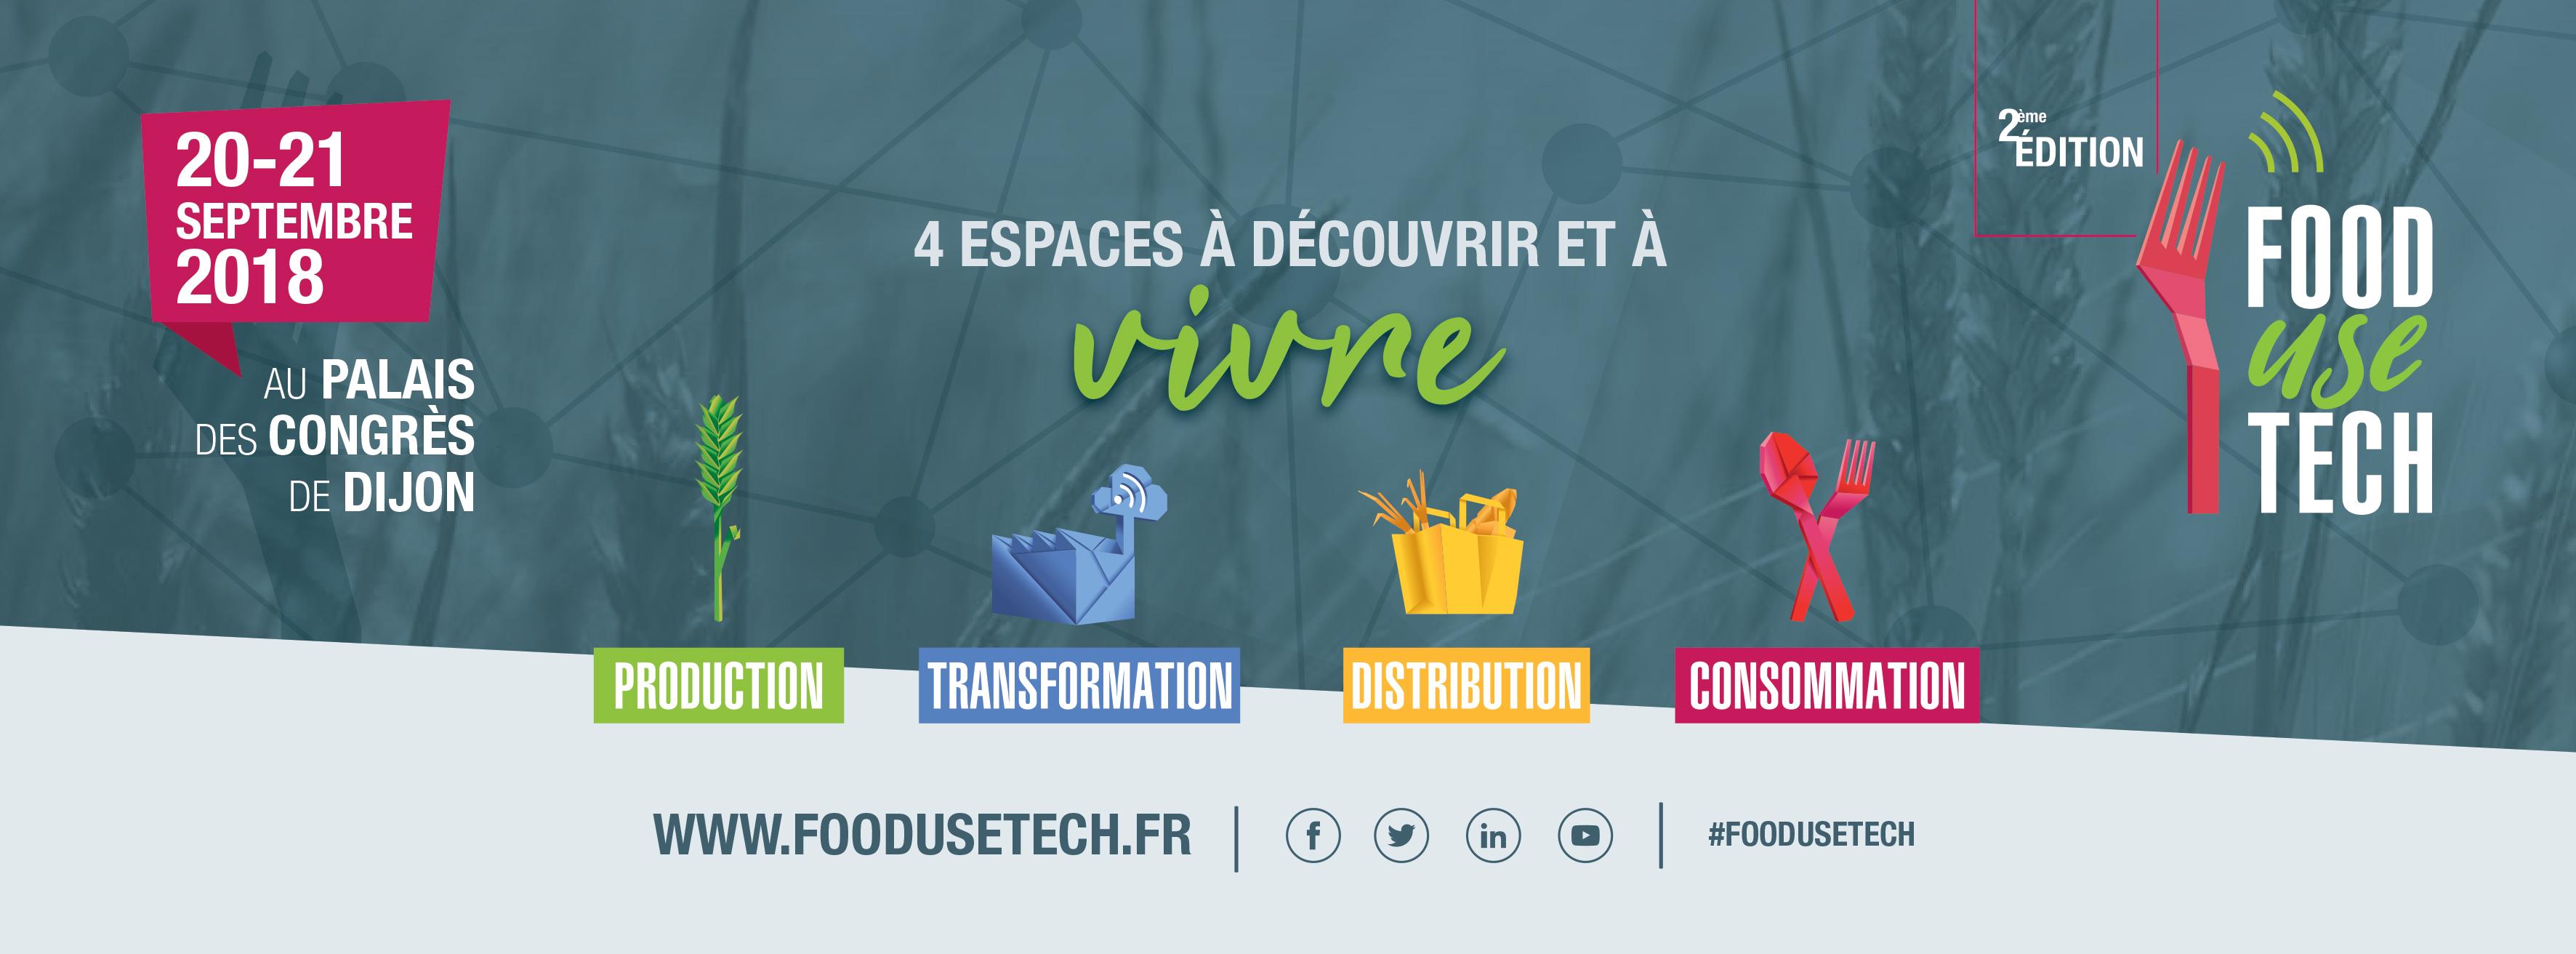 FoodUseTech